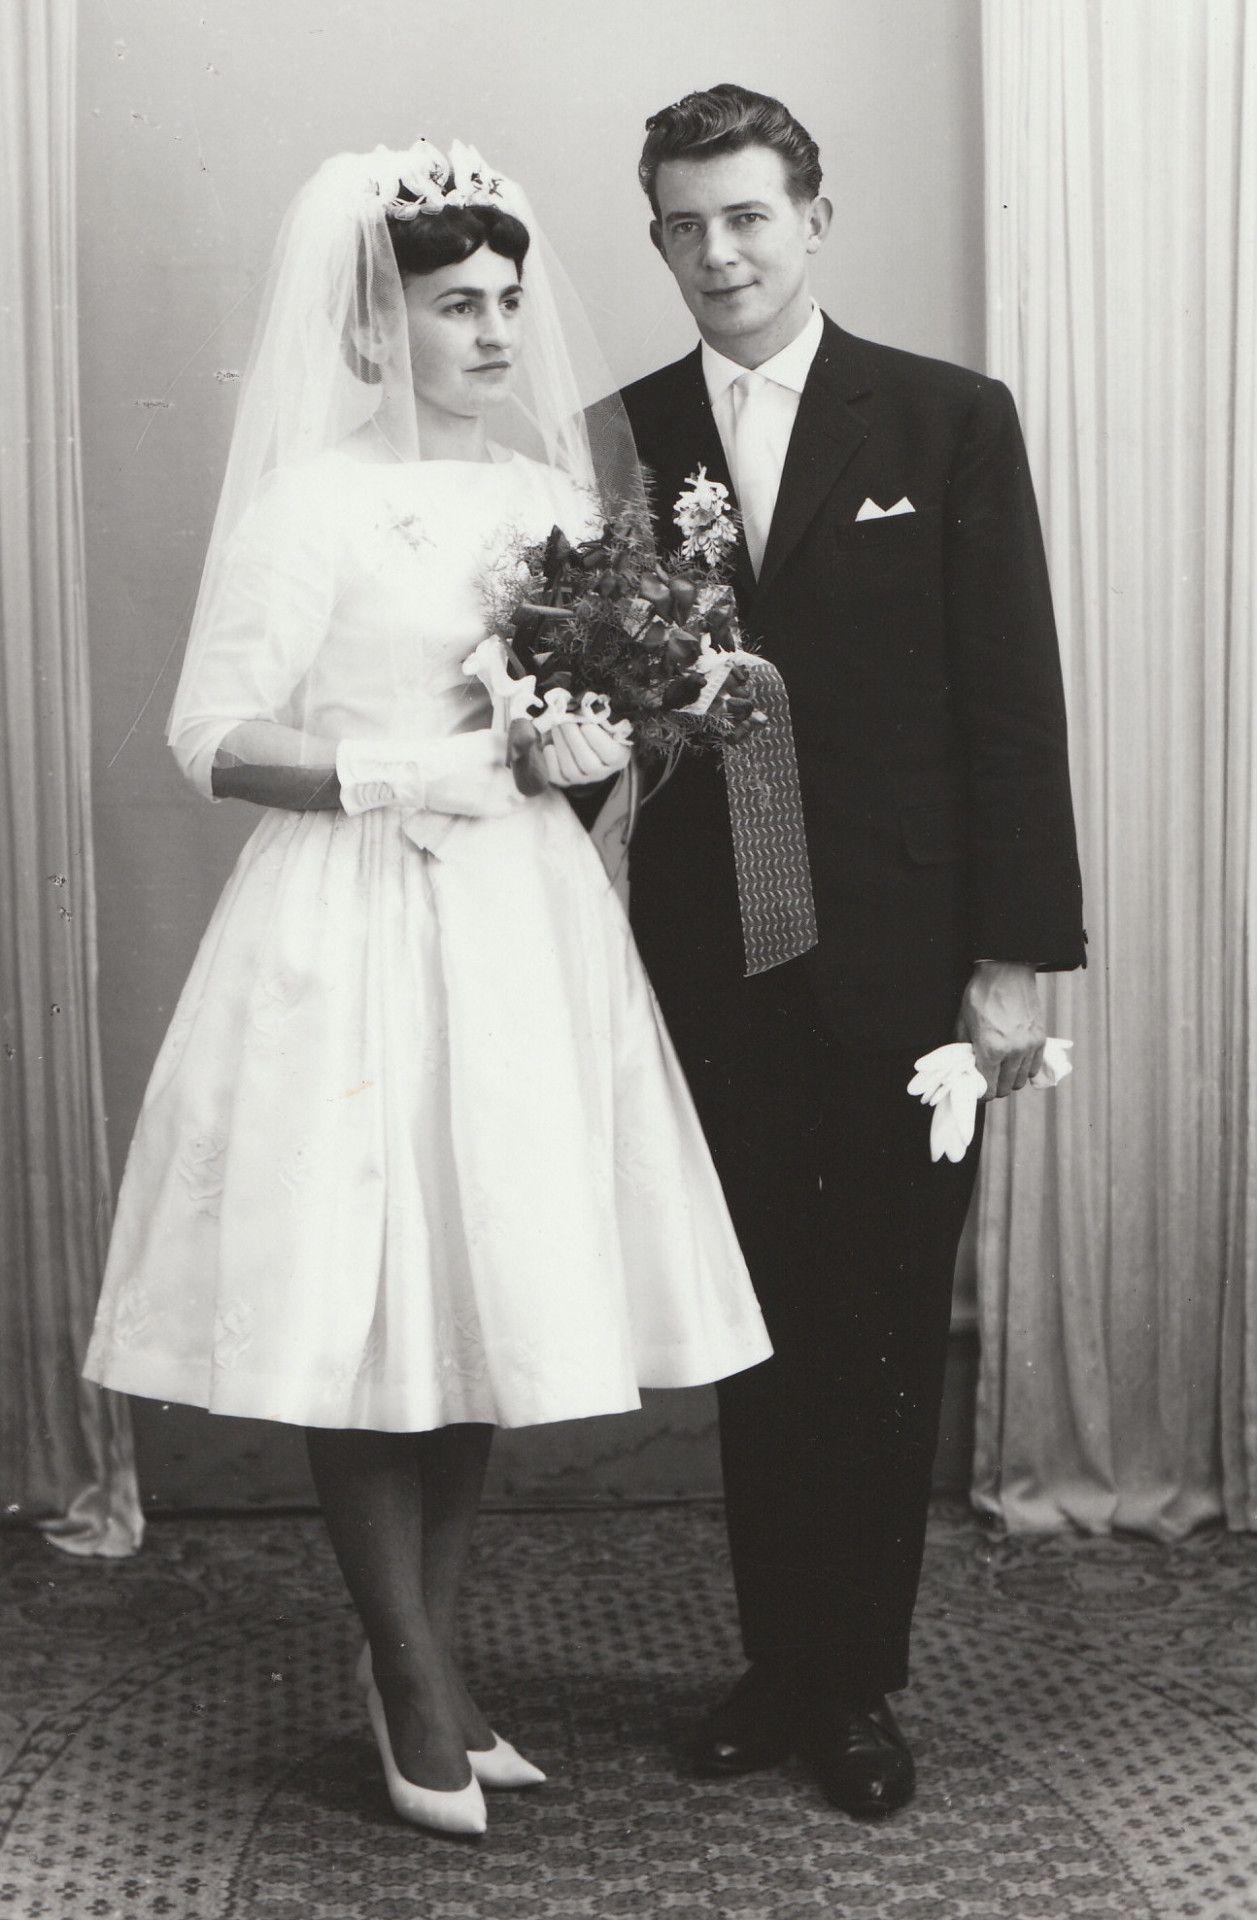 Mama june wedding dress  Pin by Vintage Braut on   Pinterest  Vintage weddings Wedding